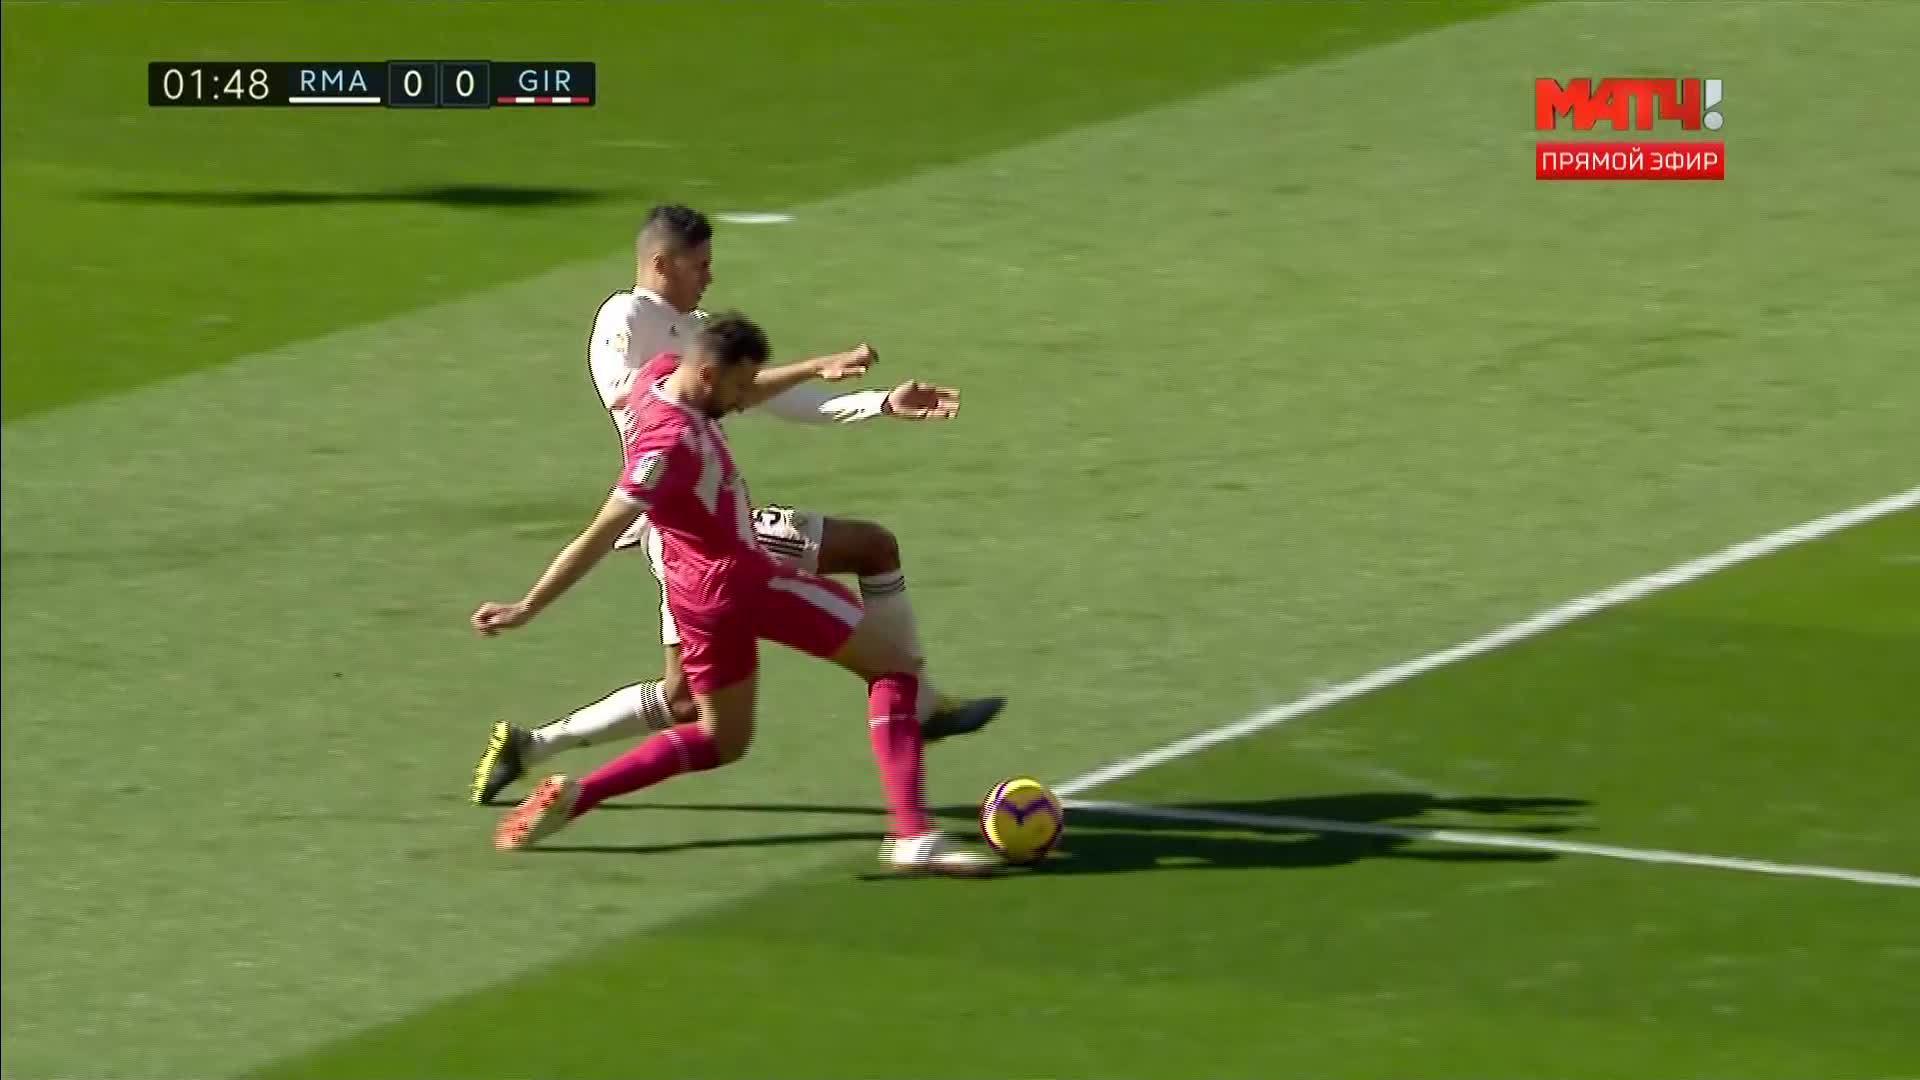 Real Madrid 1-2 Girona